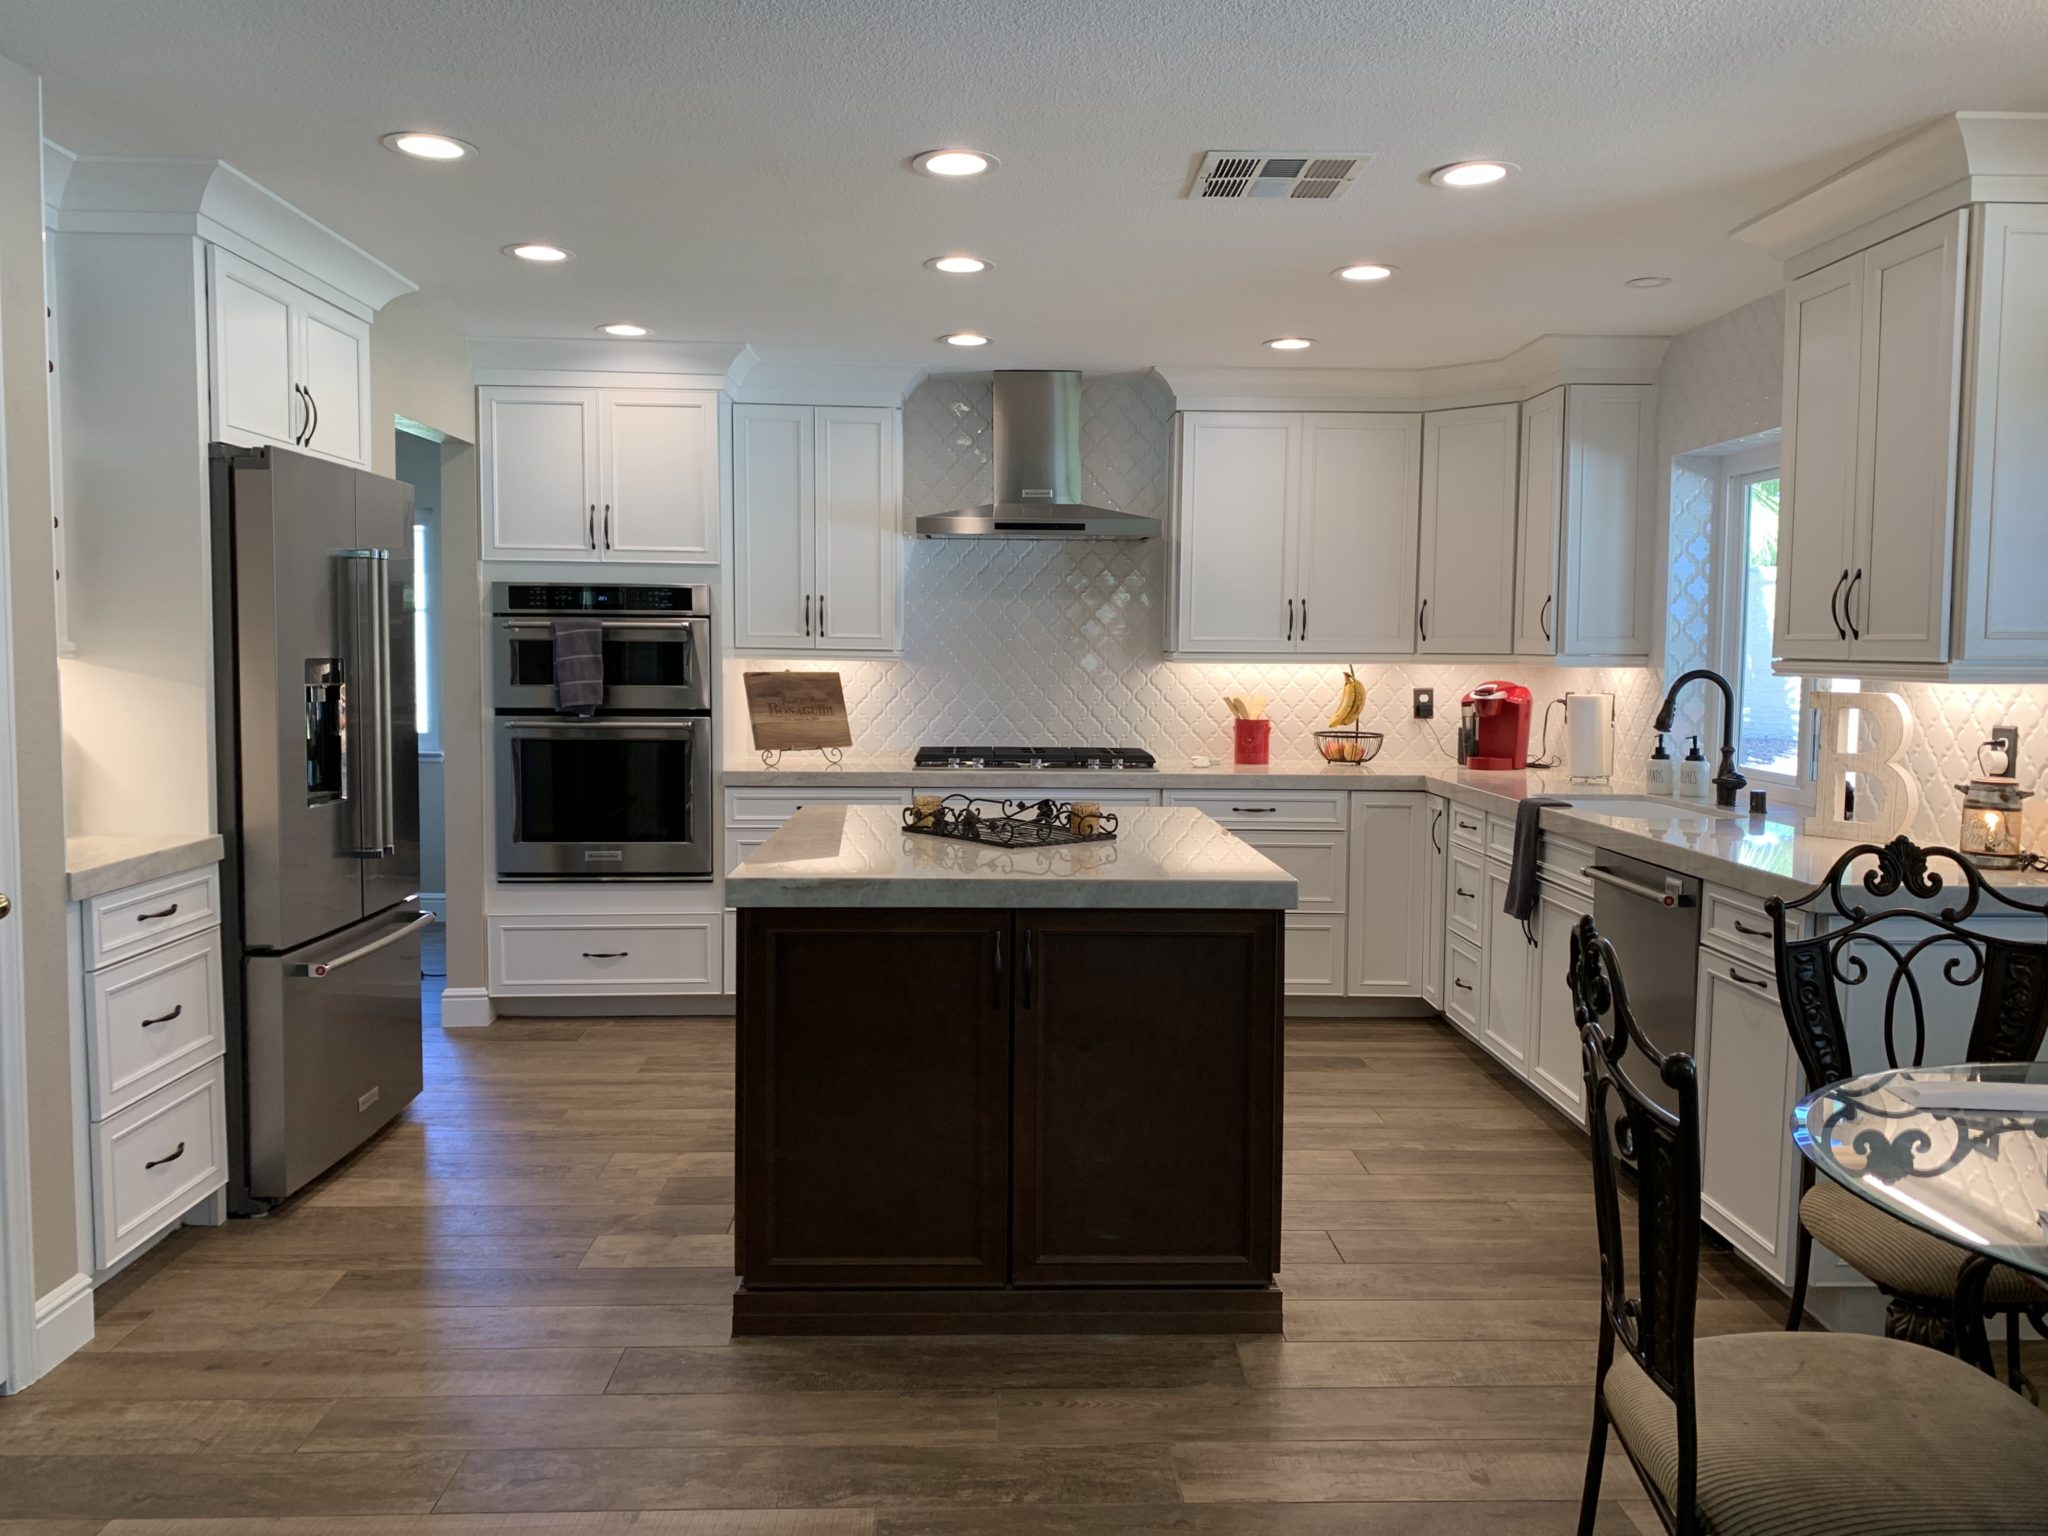 2020 Modern Renovation of a Home on Bermuda Dunes in Las Vegas